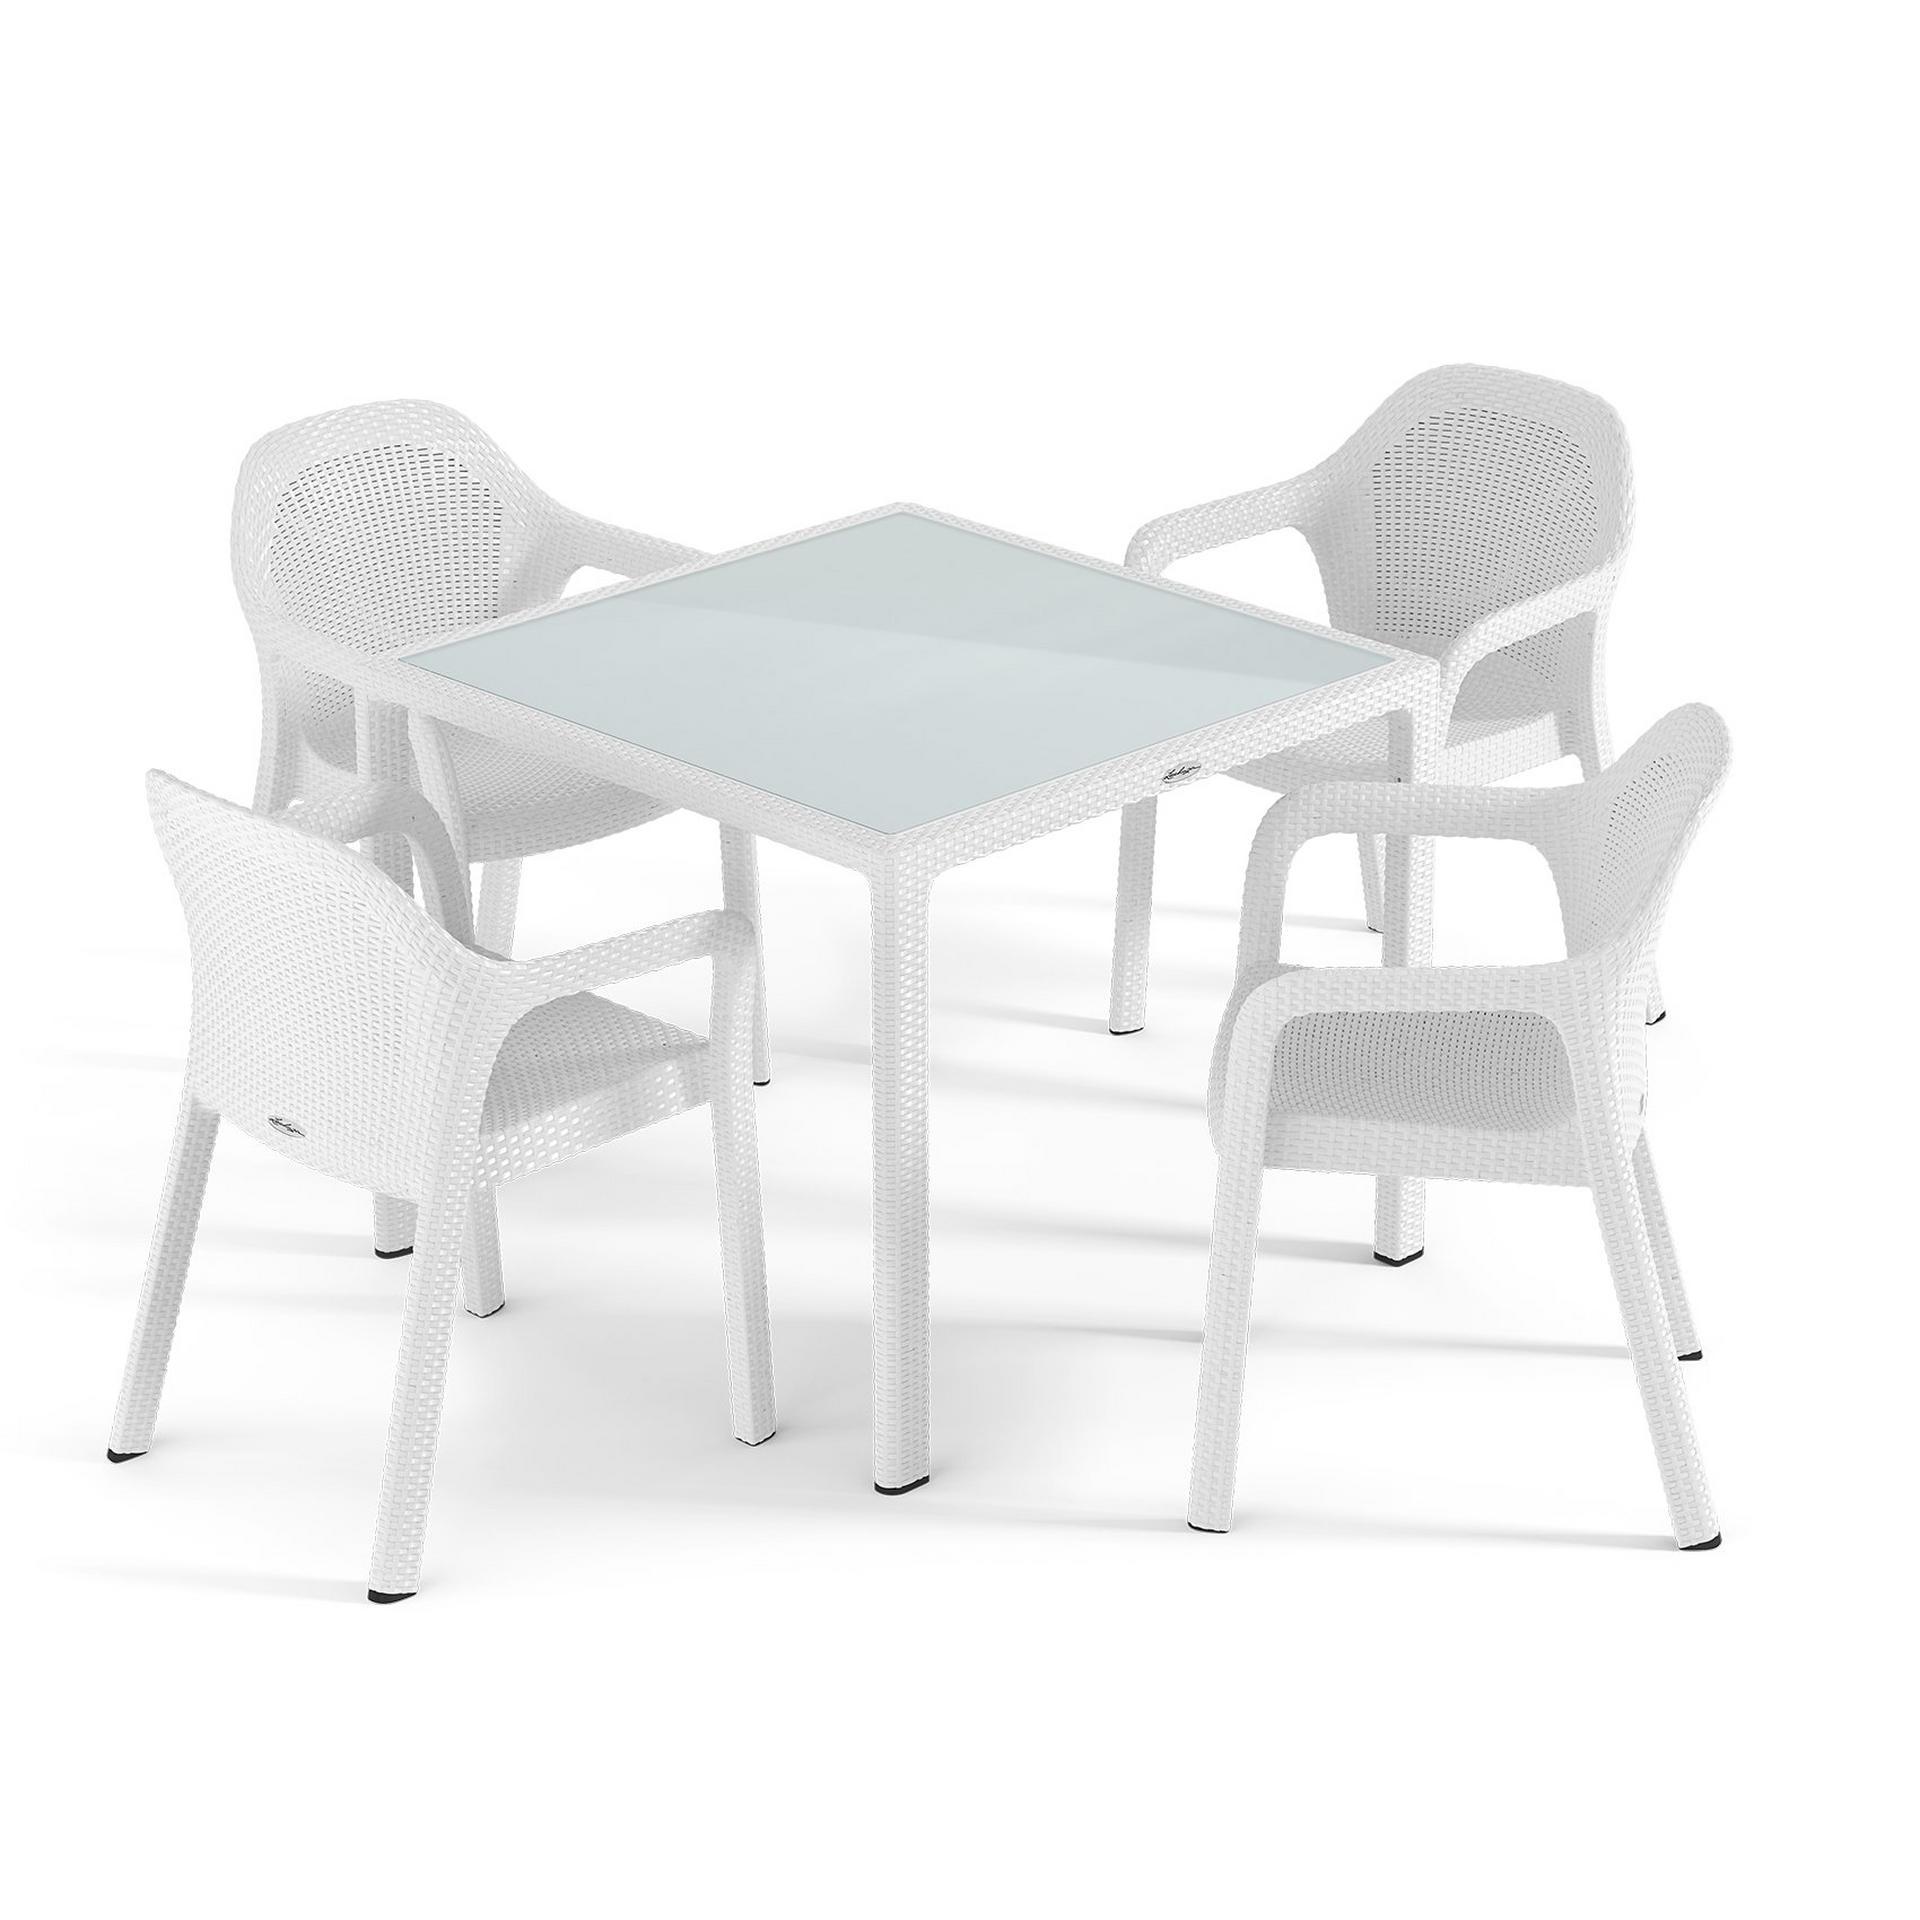 Combination Set of 5 white